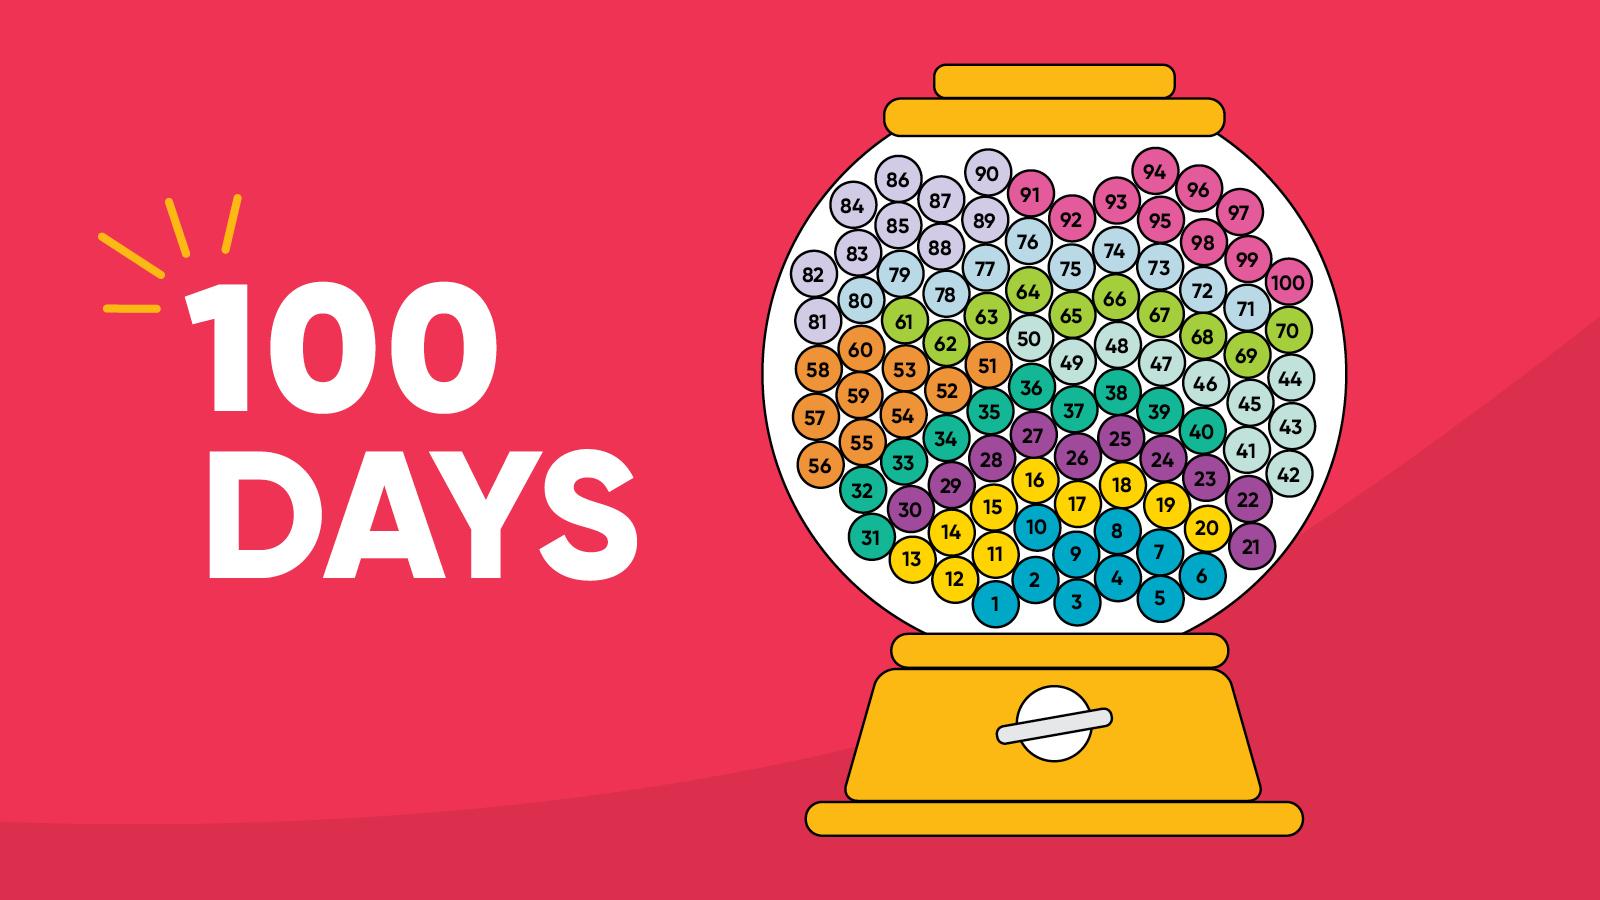 Free 100th Day Of School Gumball Machine Templates Houghton Mifflin Harcourt